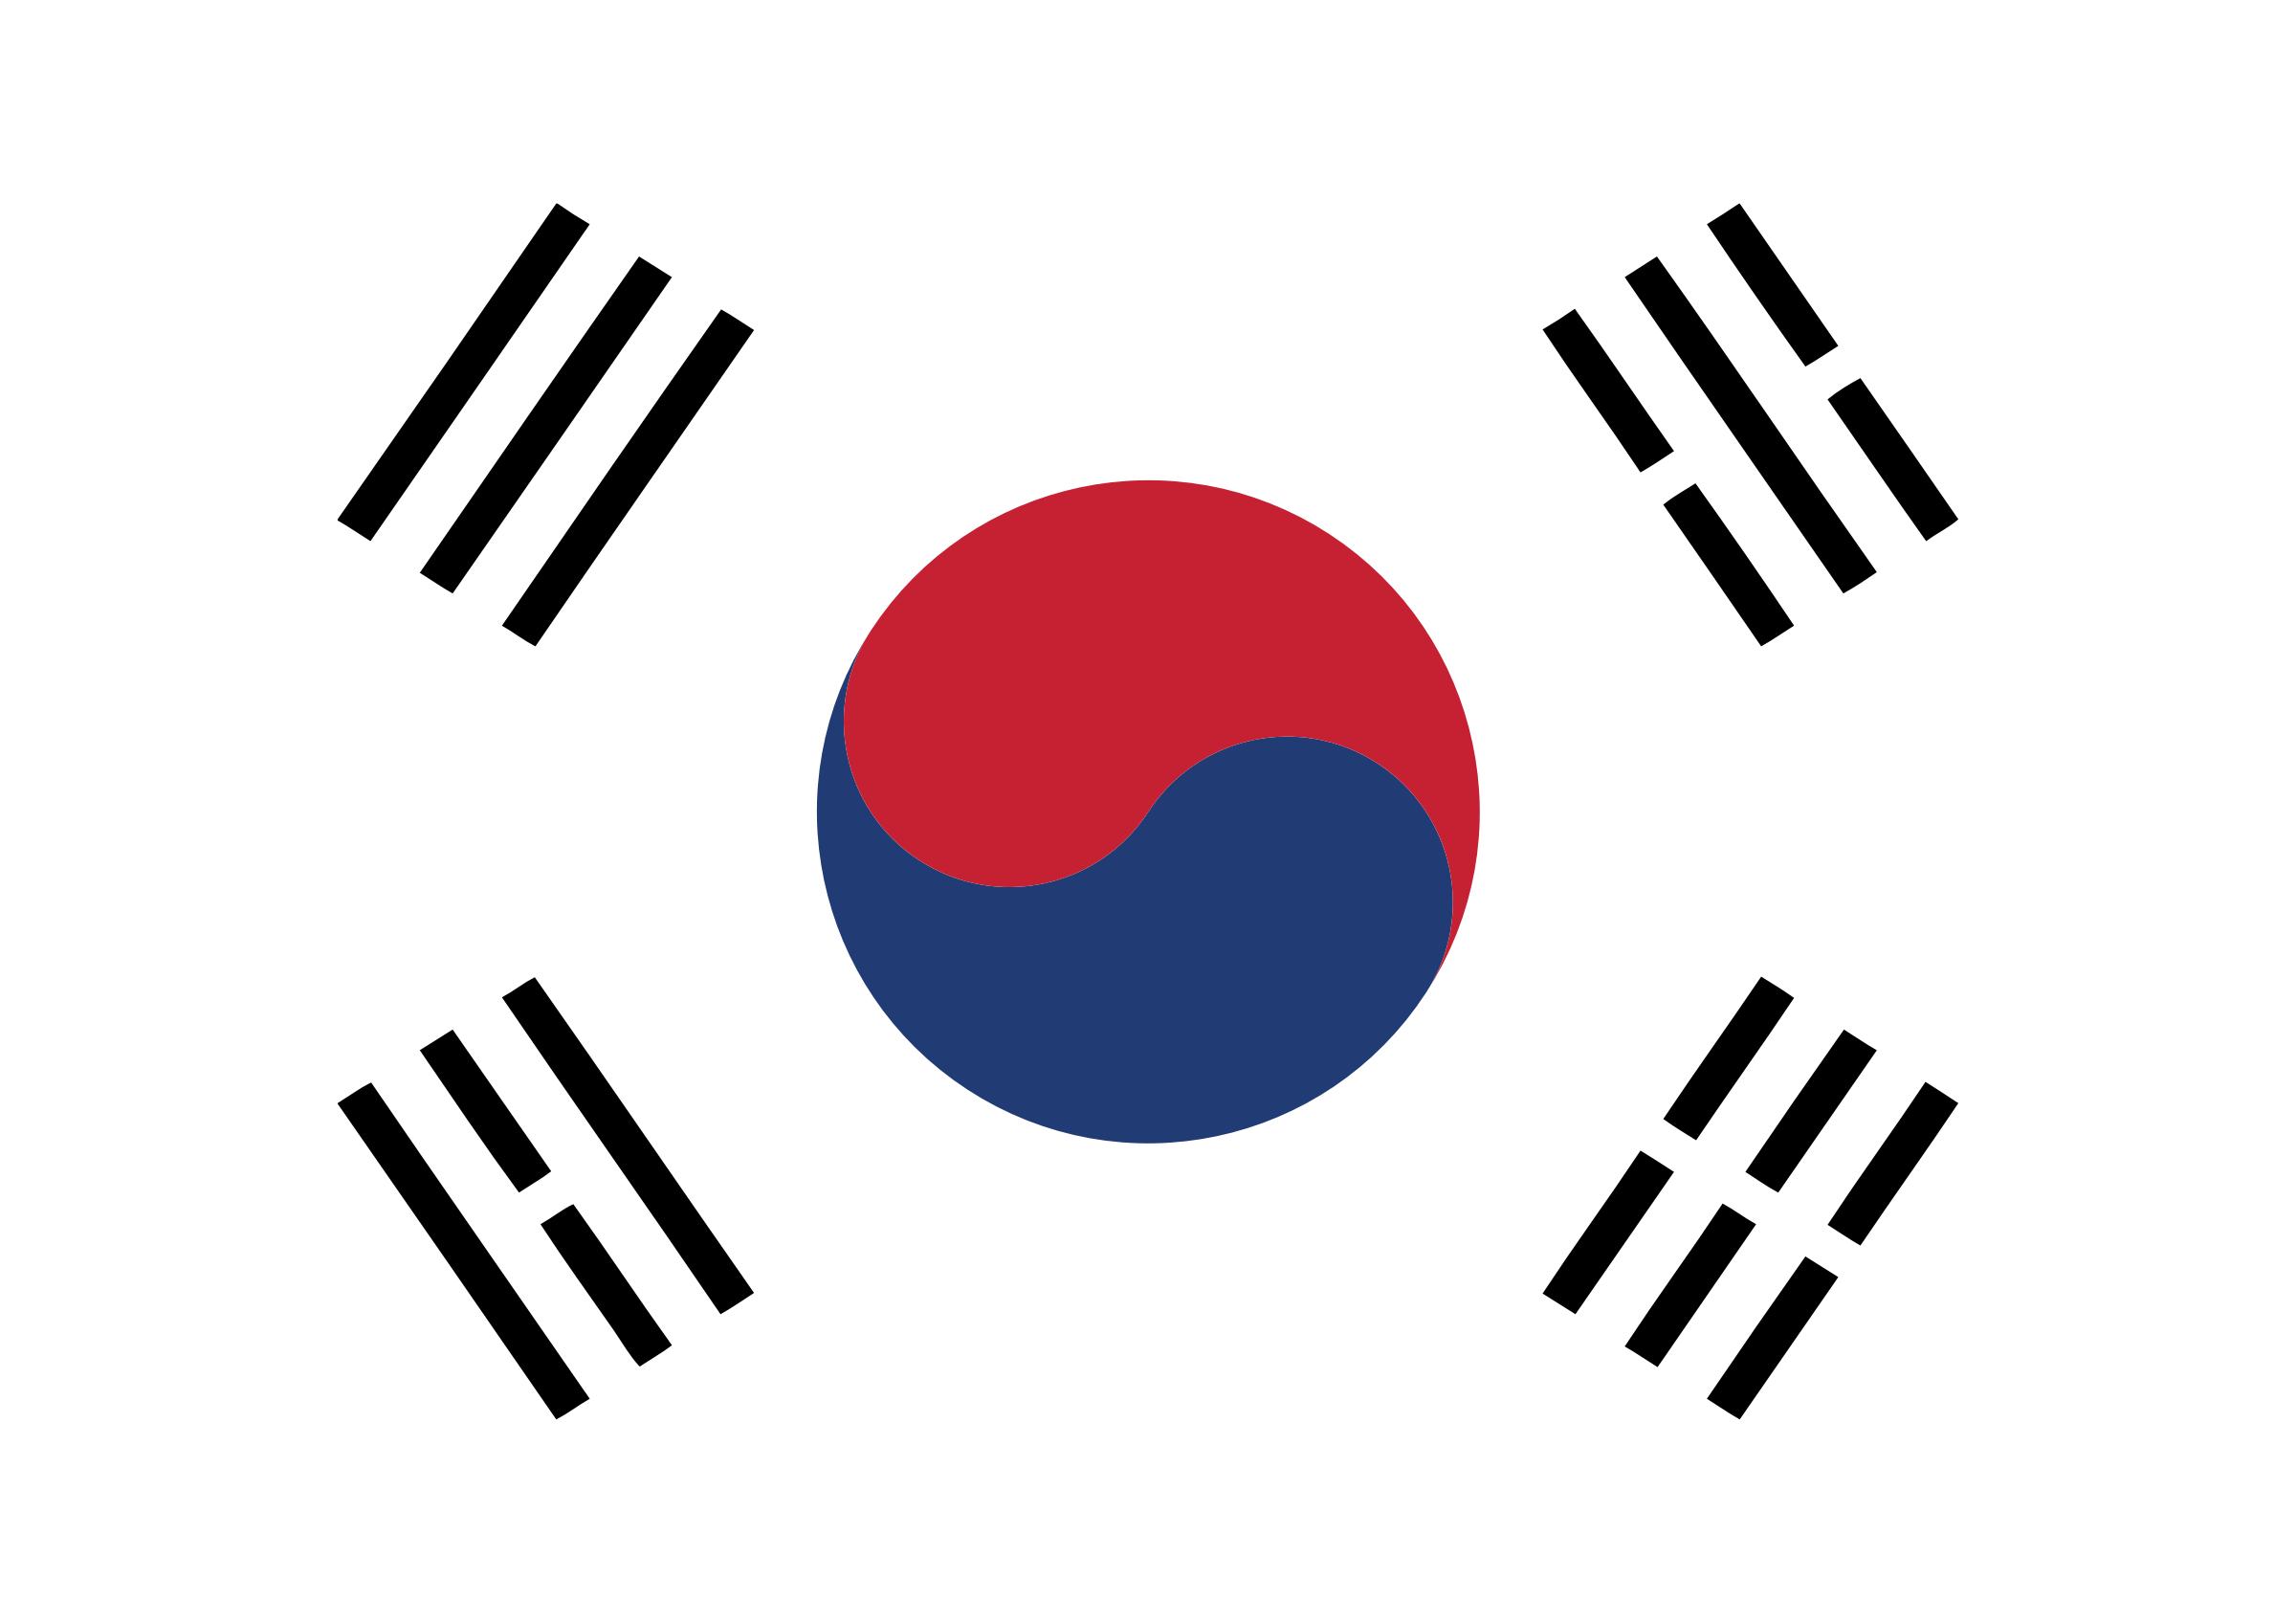 Pin South Korea Clipart South Korea Flag Clipart #2 - Korea, Transparent background PNG HD thumbnail